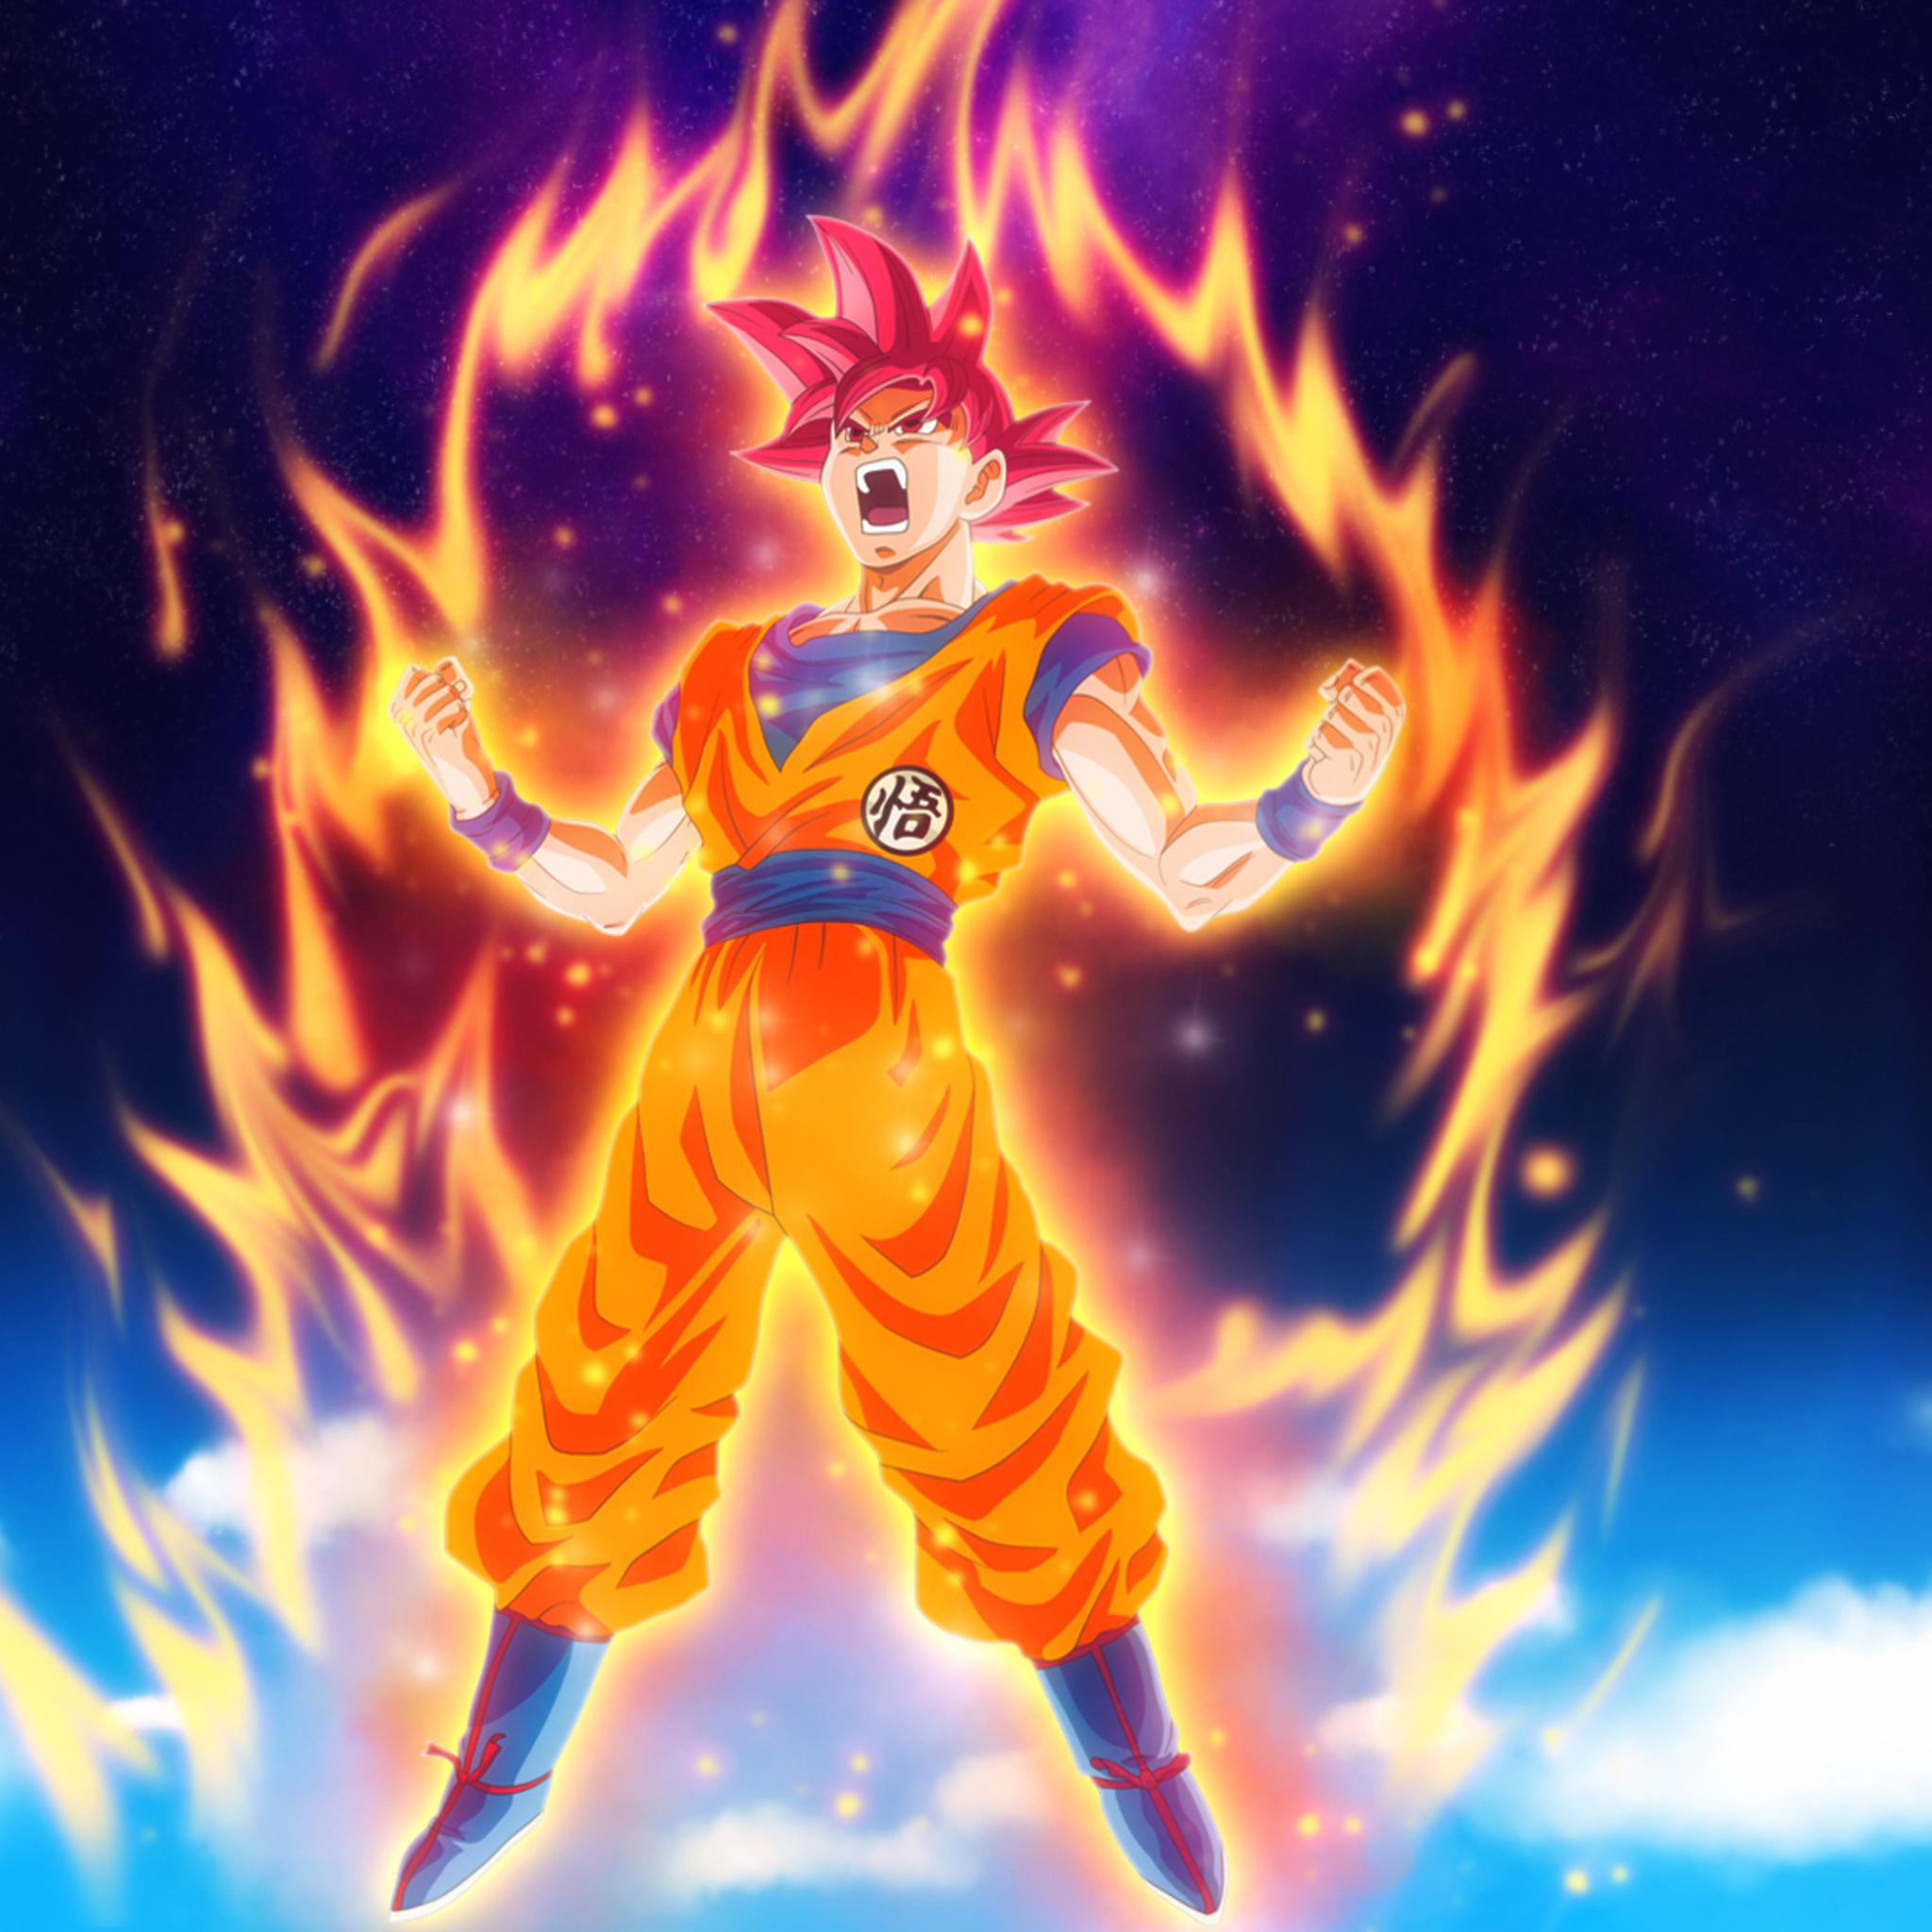 4k Wallpaper Dragon Ball: 2048x2048 Dragon Ball Z Goku Ipad Air HD 4k Wallpapers